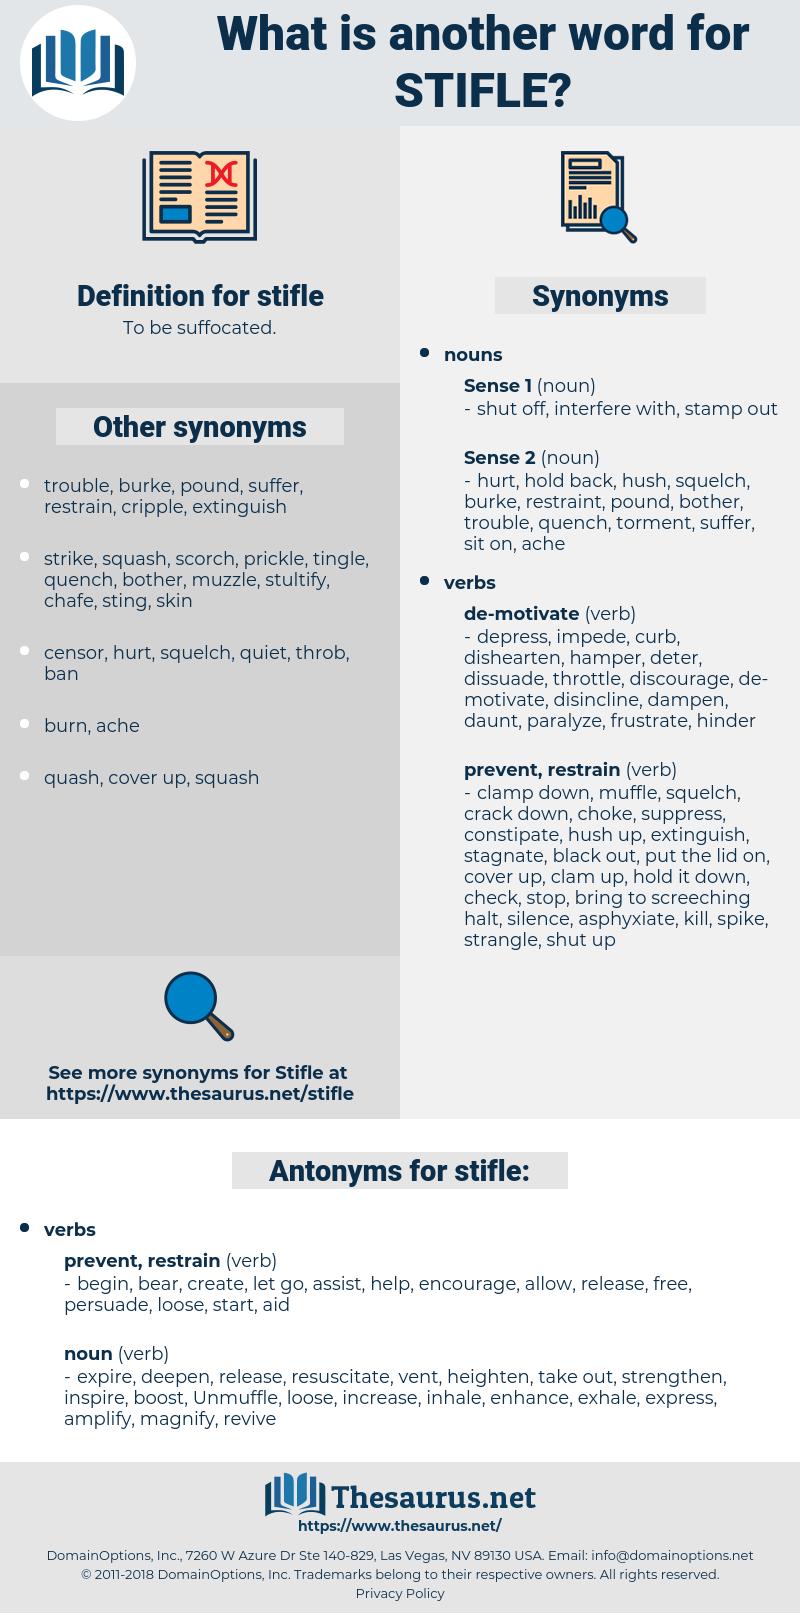 stifle, synonym stifle, another word for stifle, words like stifle, thesaurus stifle